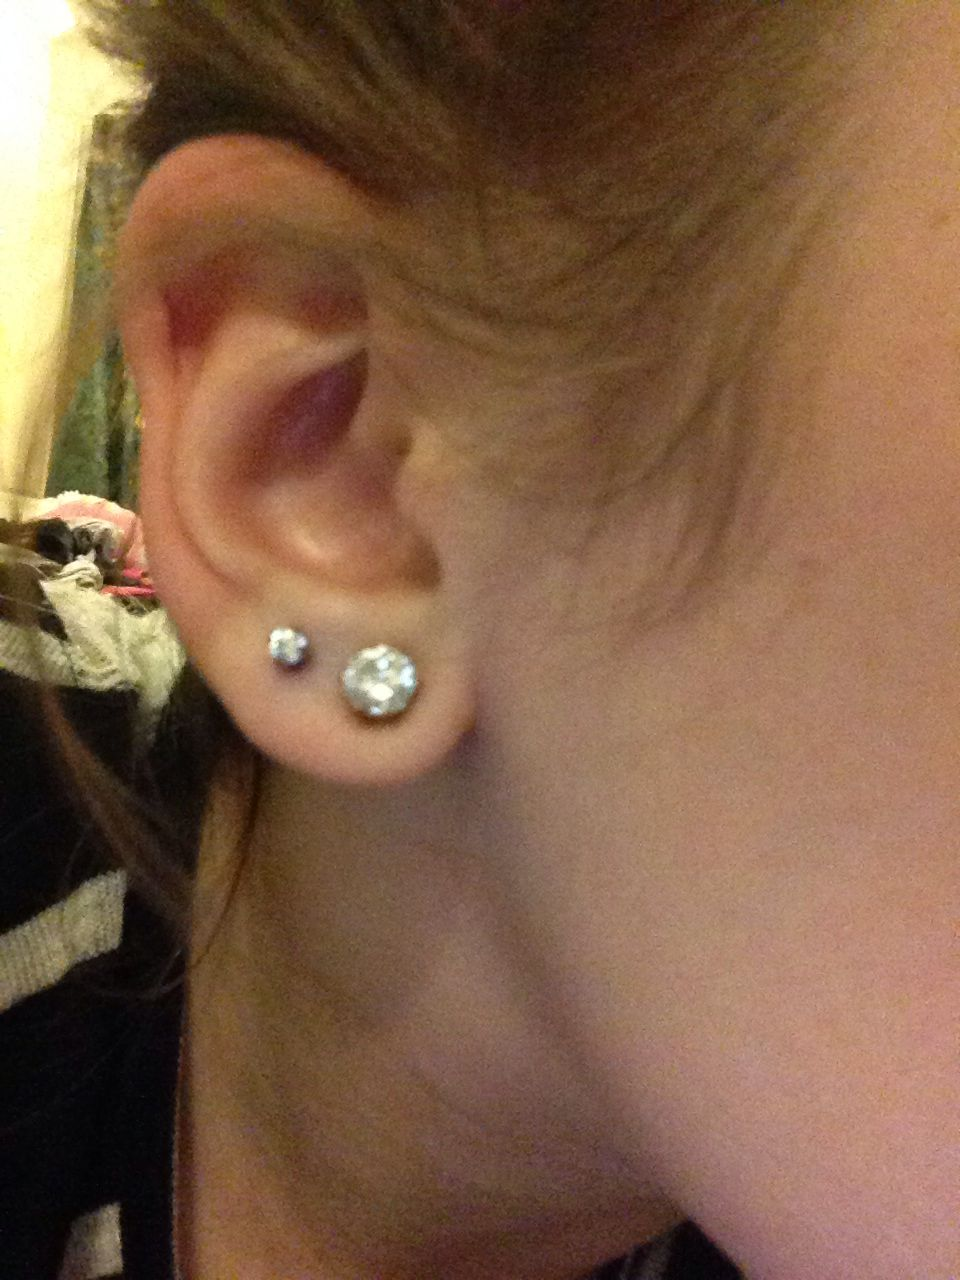 Second ear piercing ideas  Got my second ear piercing  So cute  Want Want Want